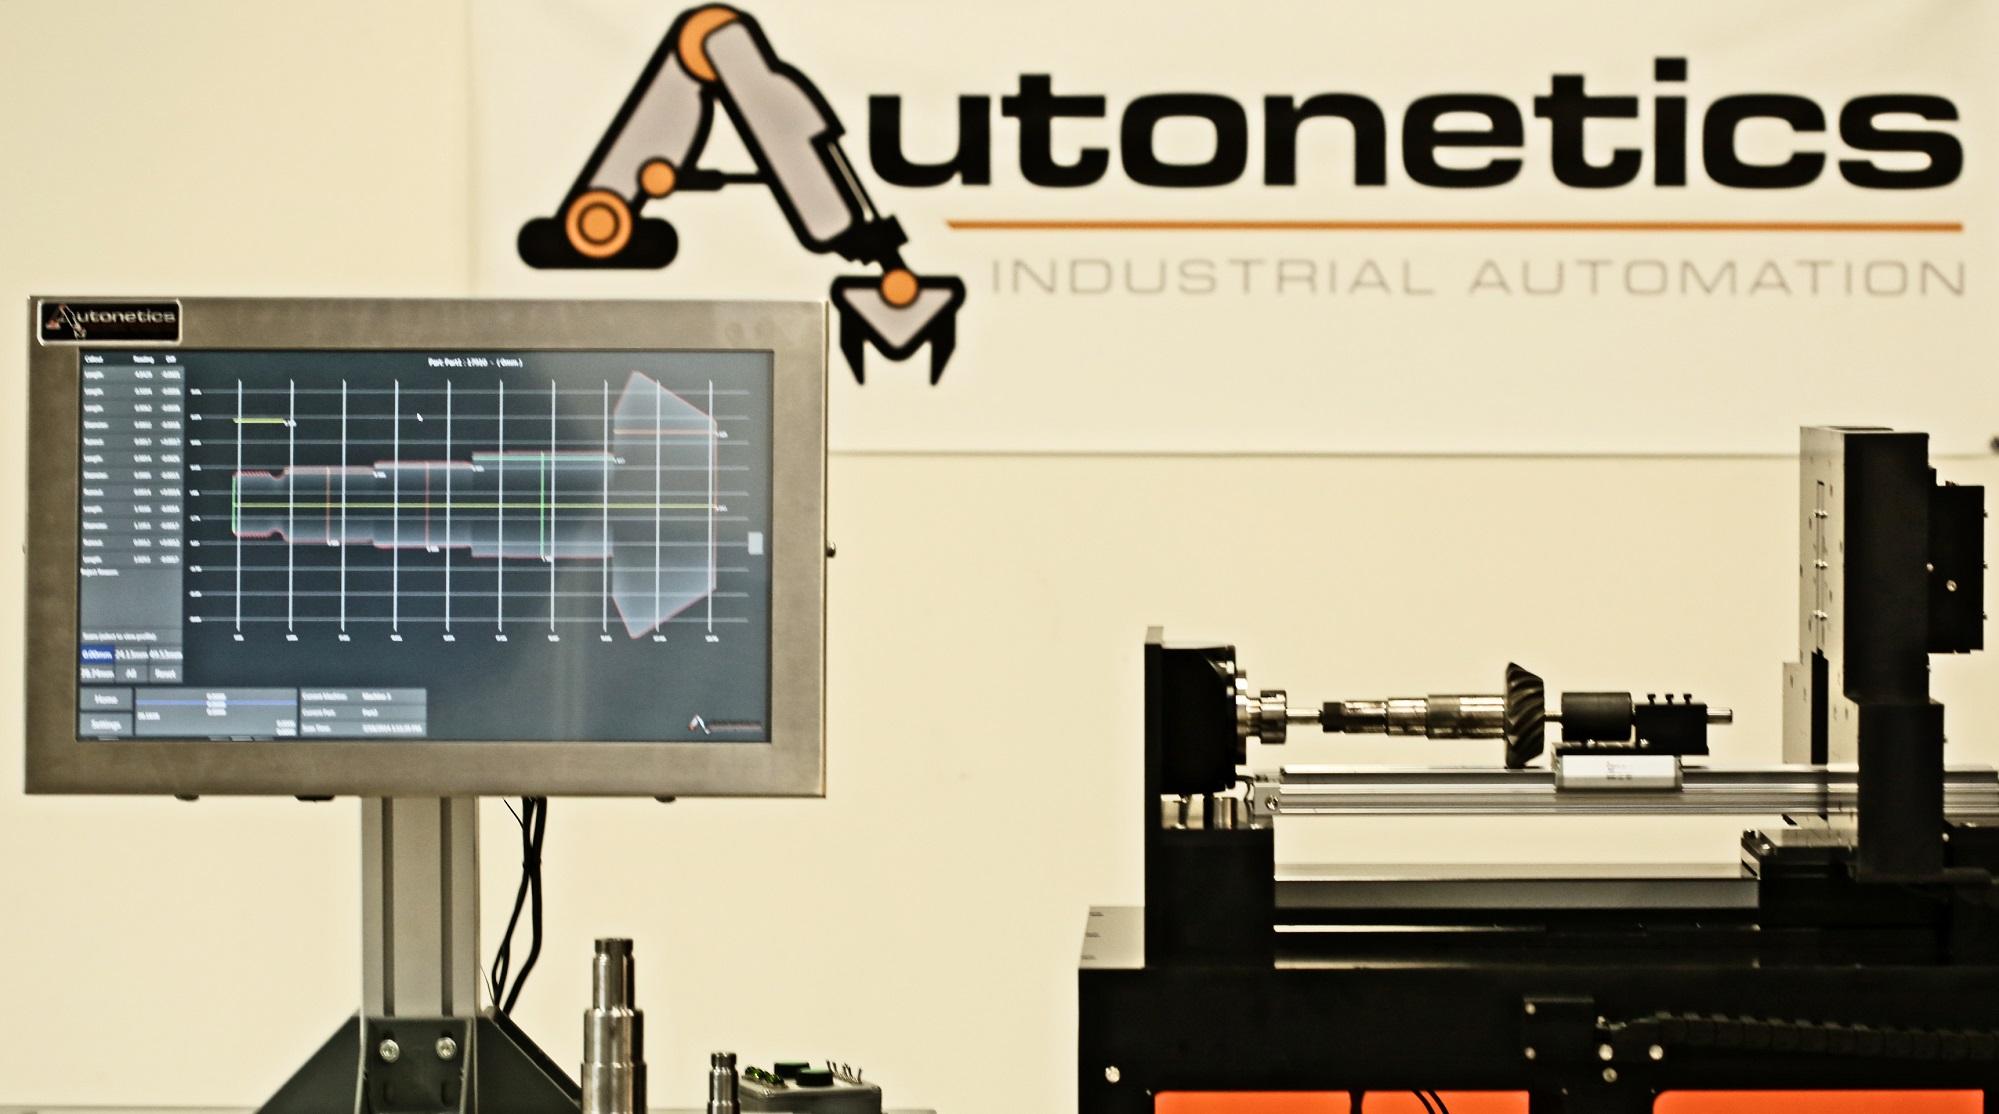 Autonetics Logo and HMI